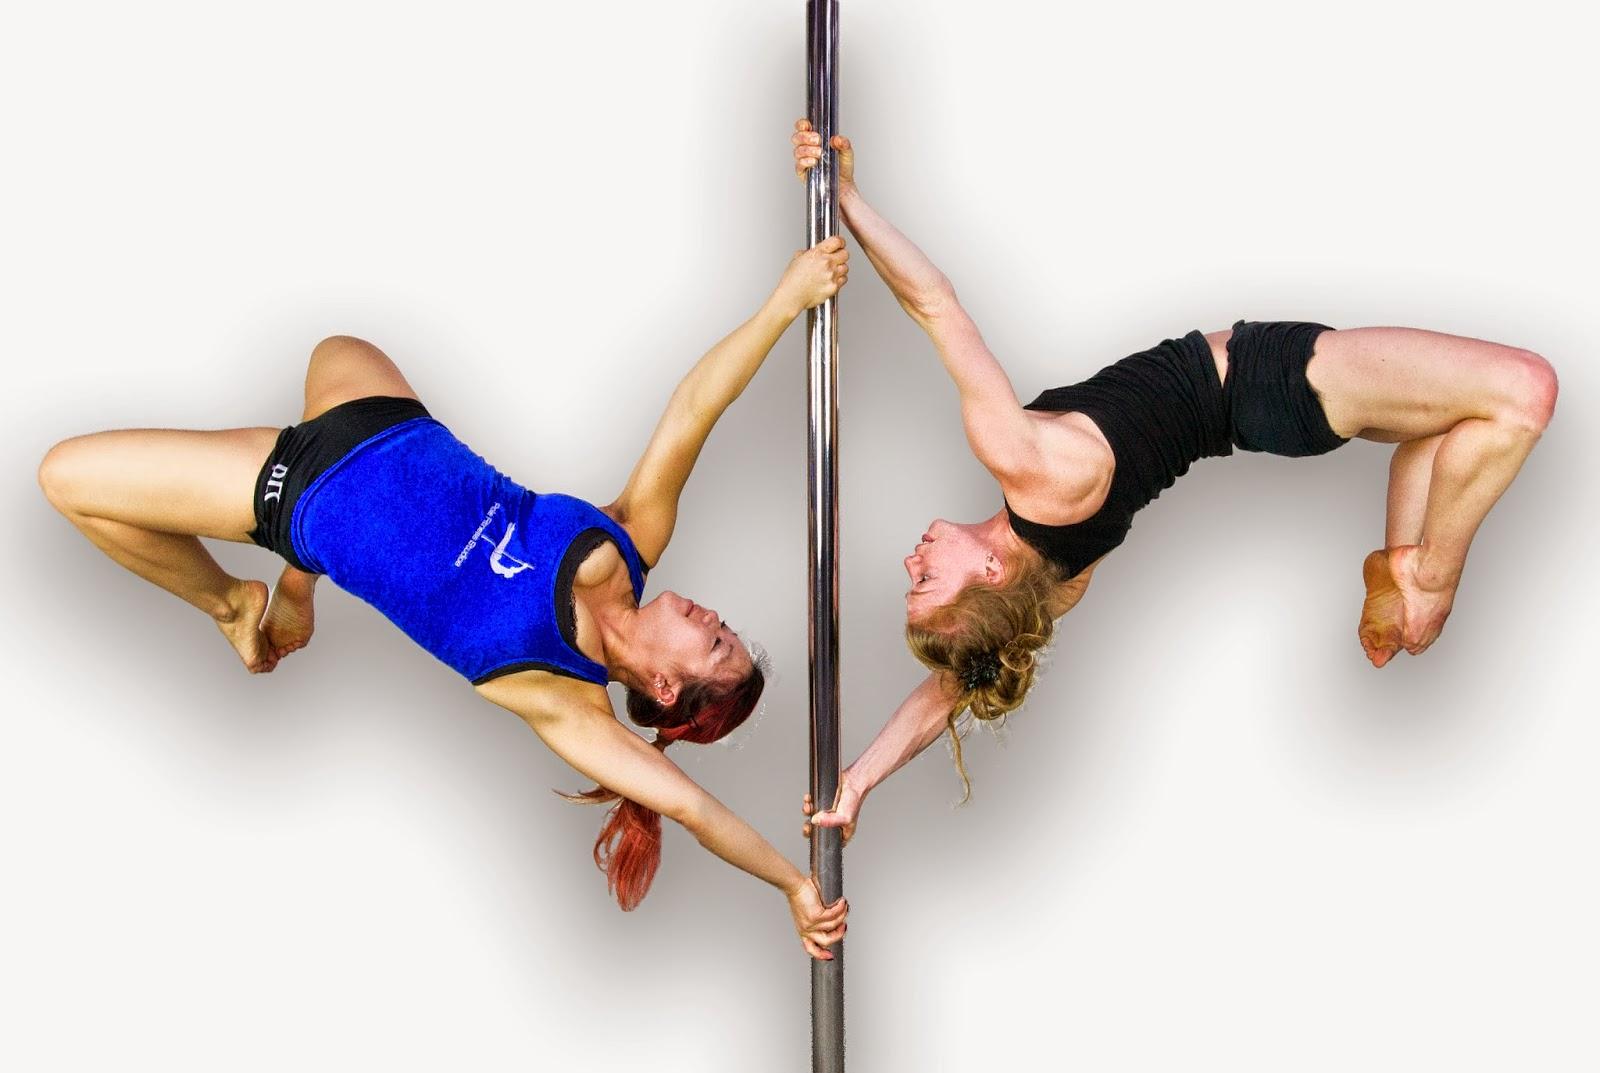 pole fitness studios august 2014